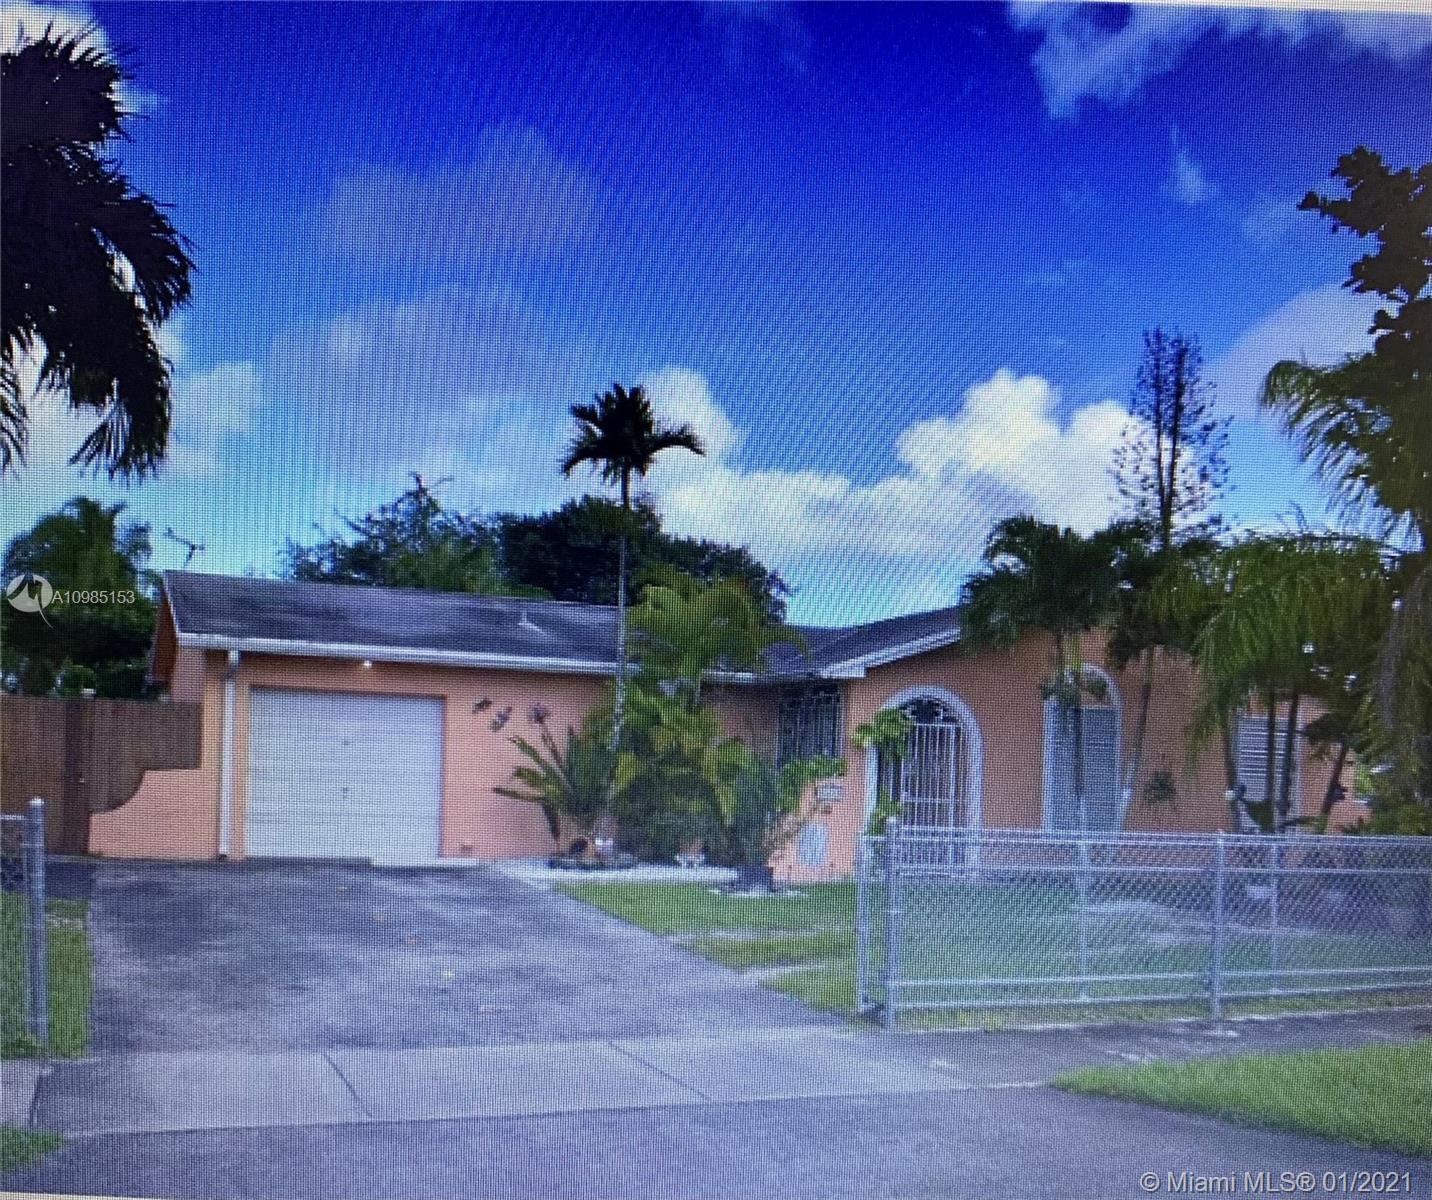 26683 Sw 125th Ct Property Photo